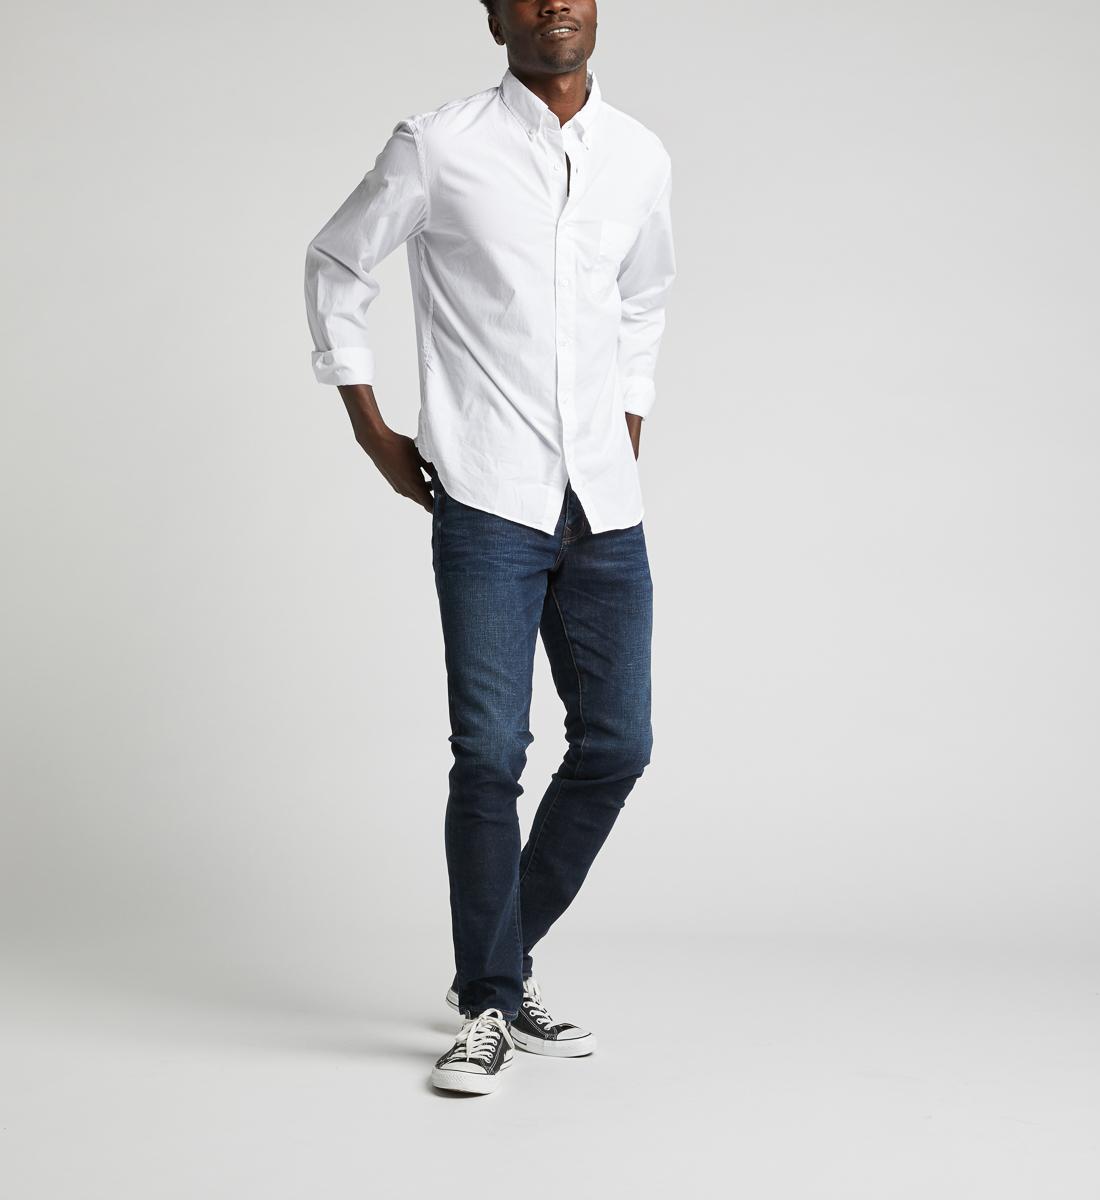 Silver Jeans Kenaston